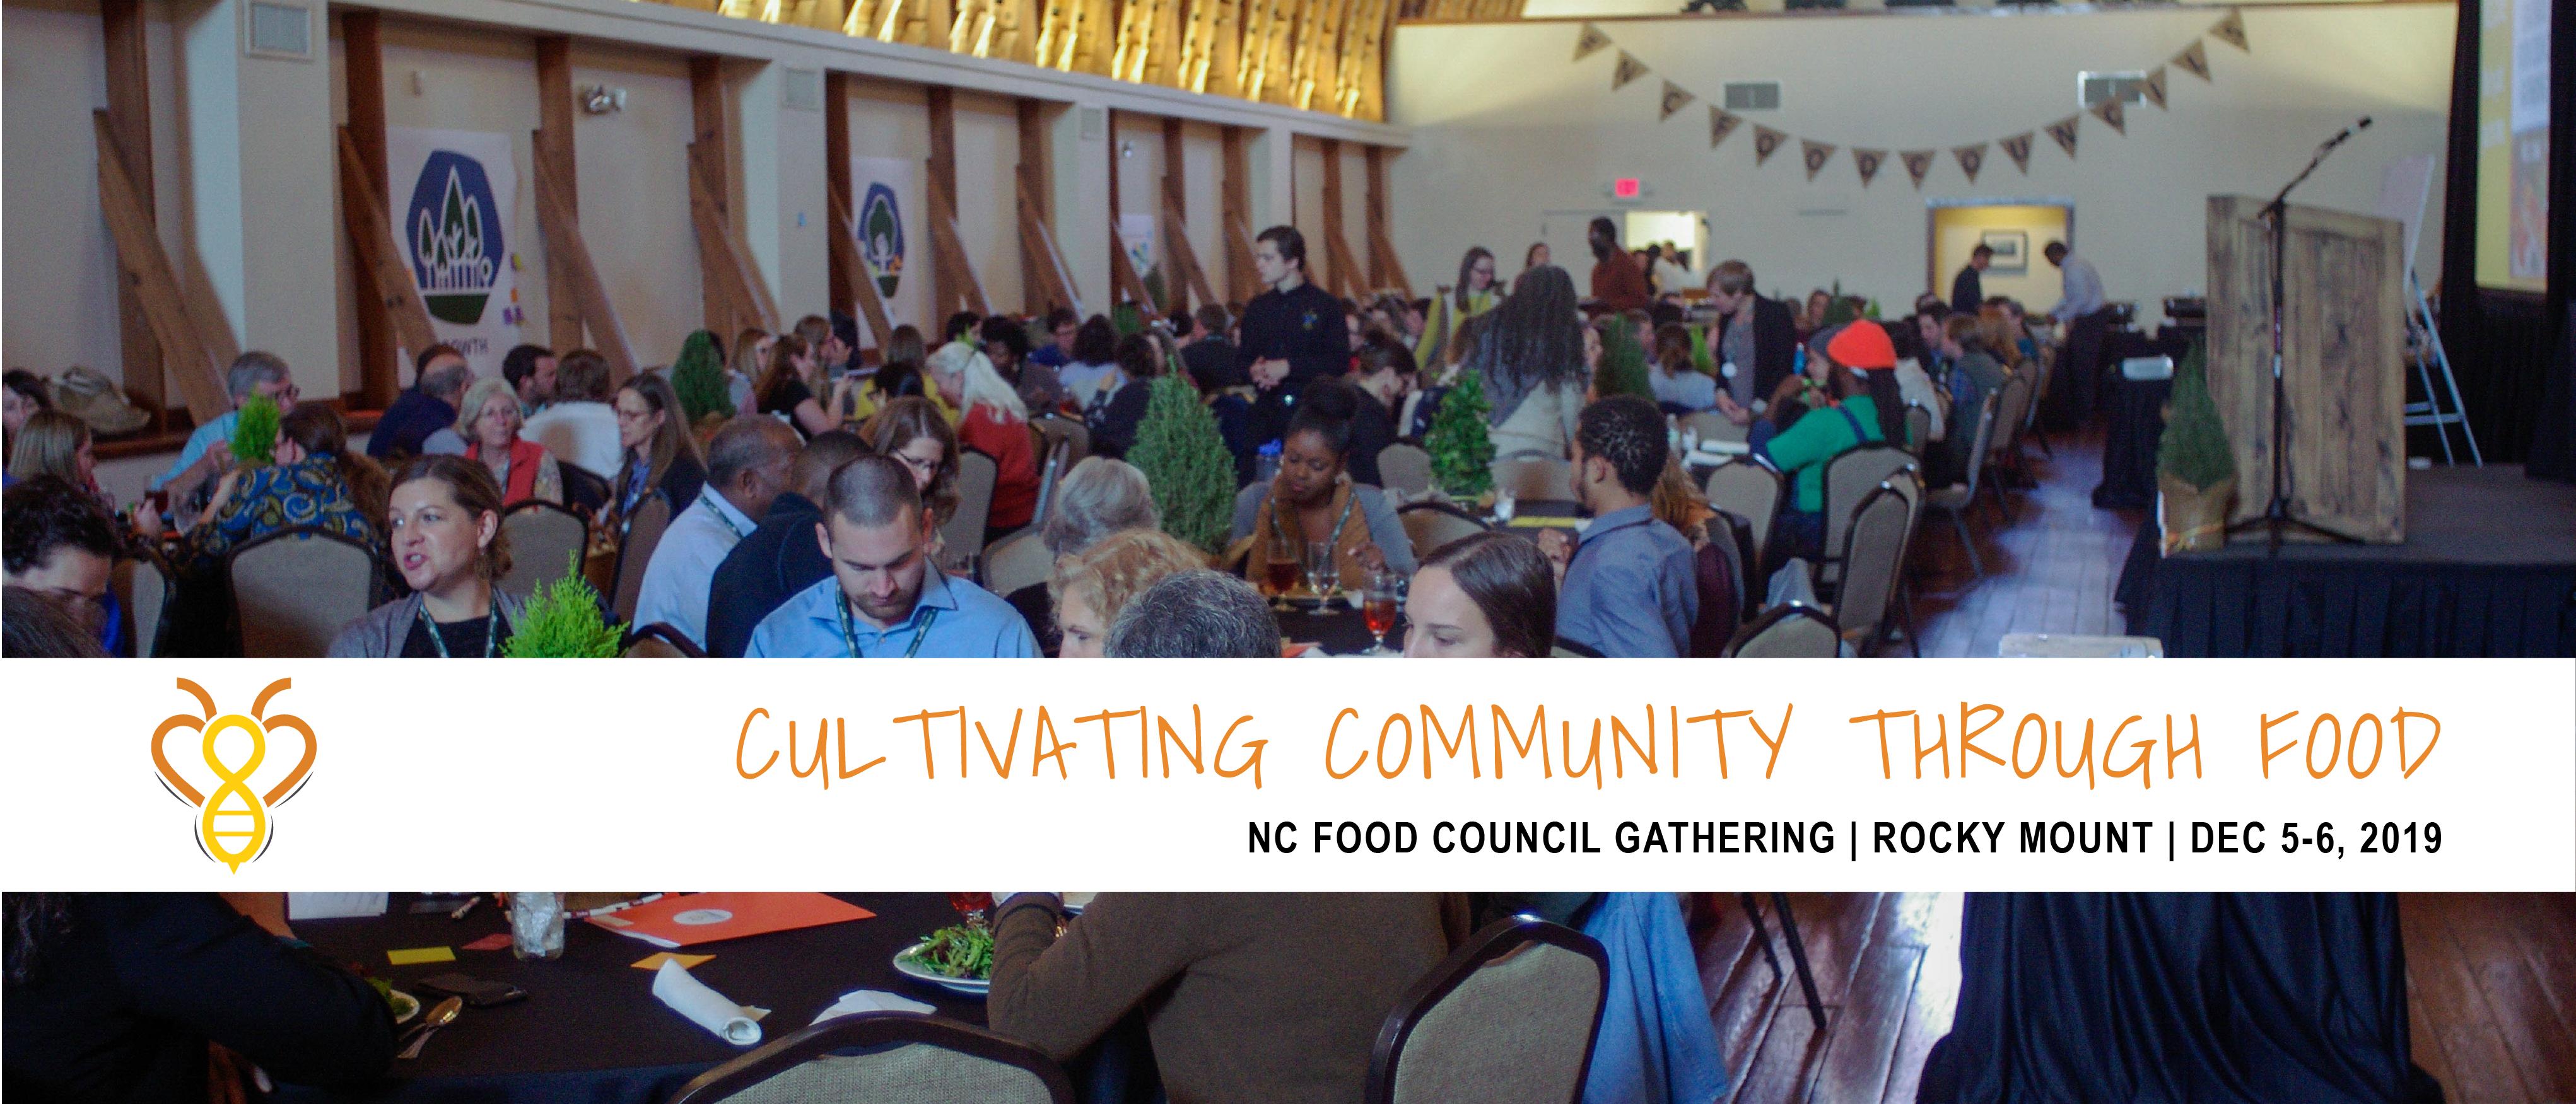 NC Food Council Gathering 2019